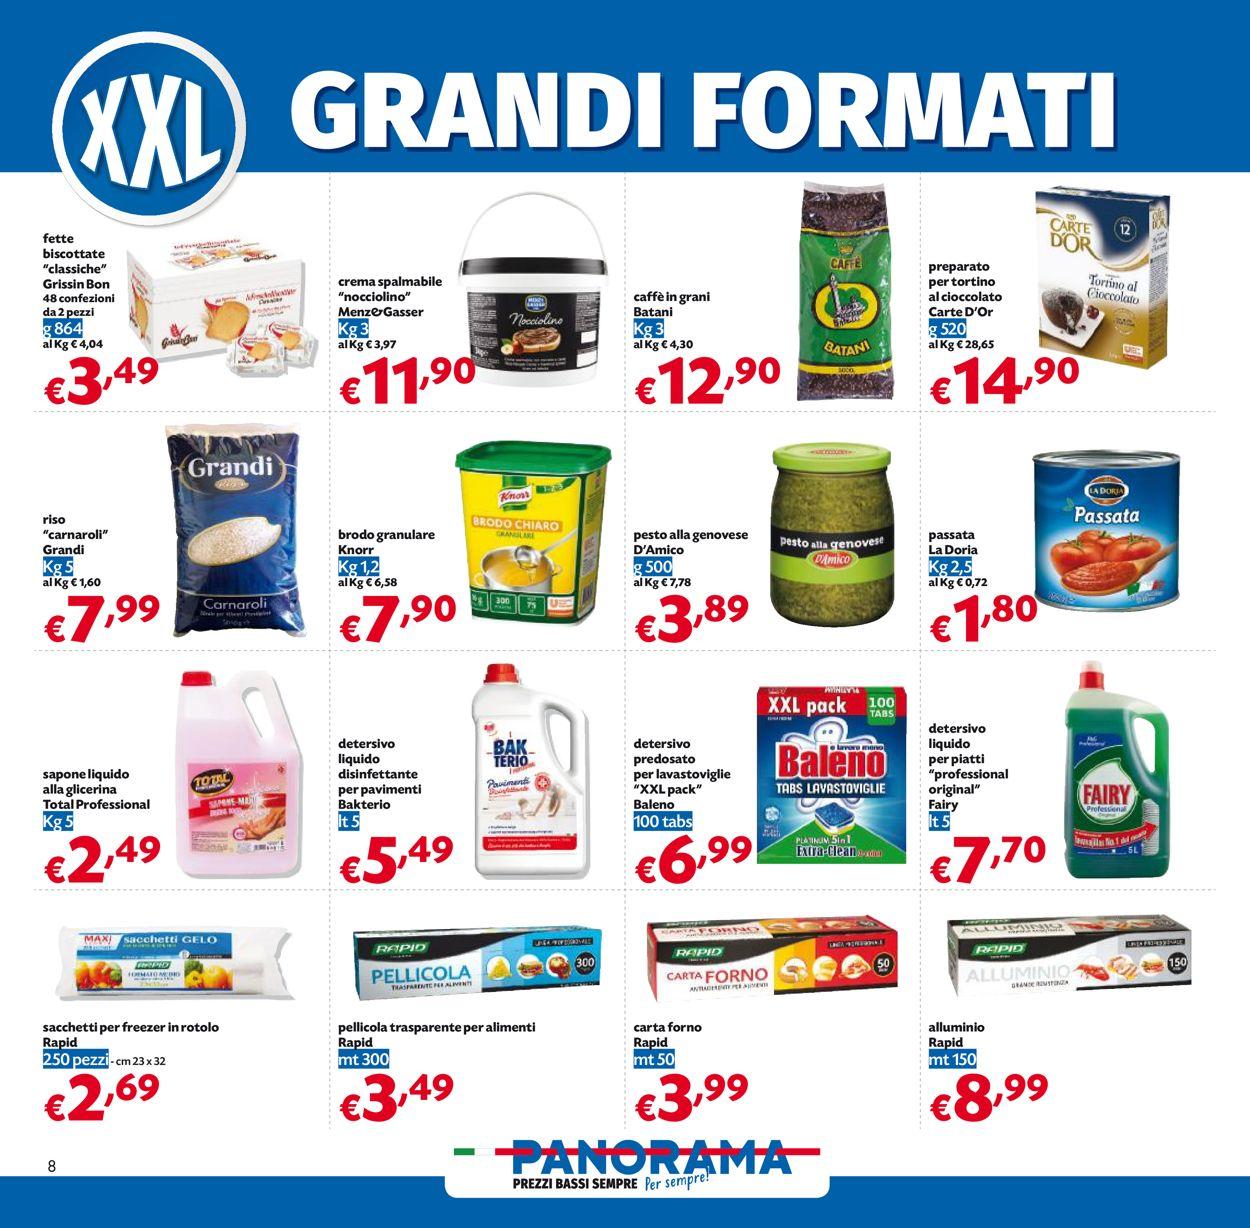 Volantino Pam Panorama - Offerte 30/12-13/01/2021 (Pagina 8)